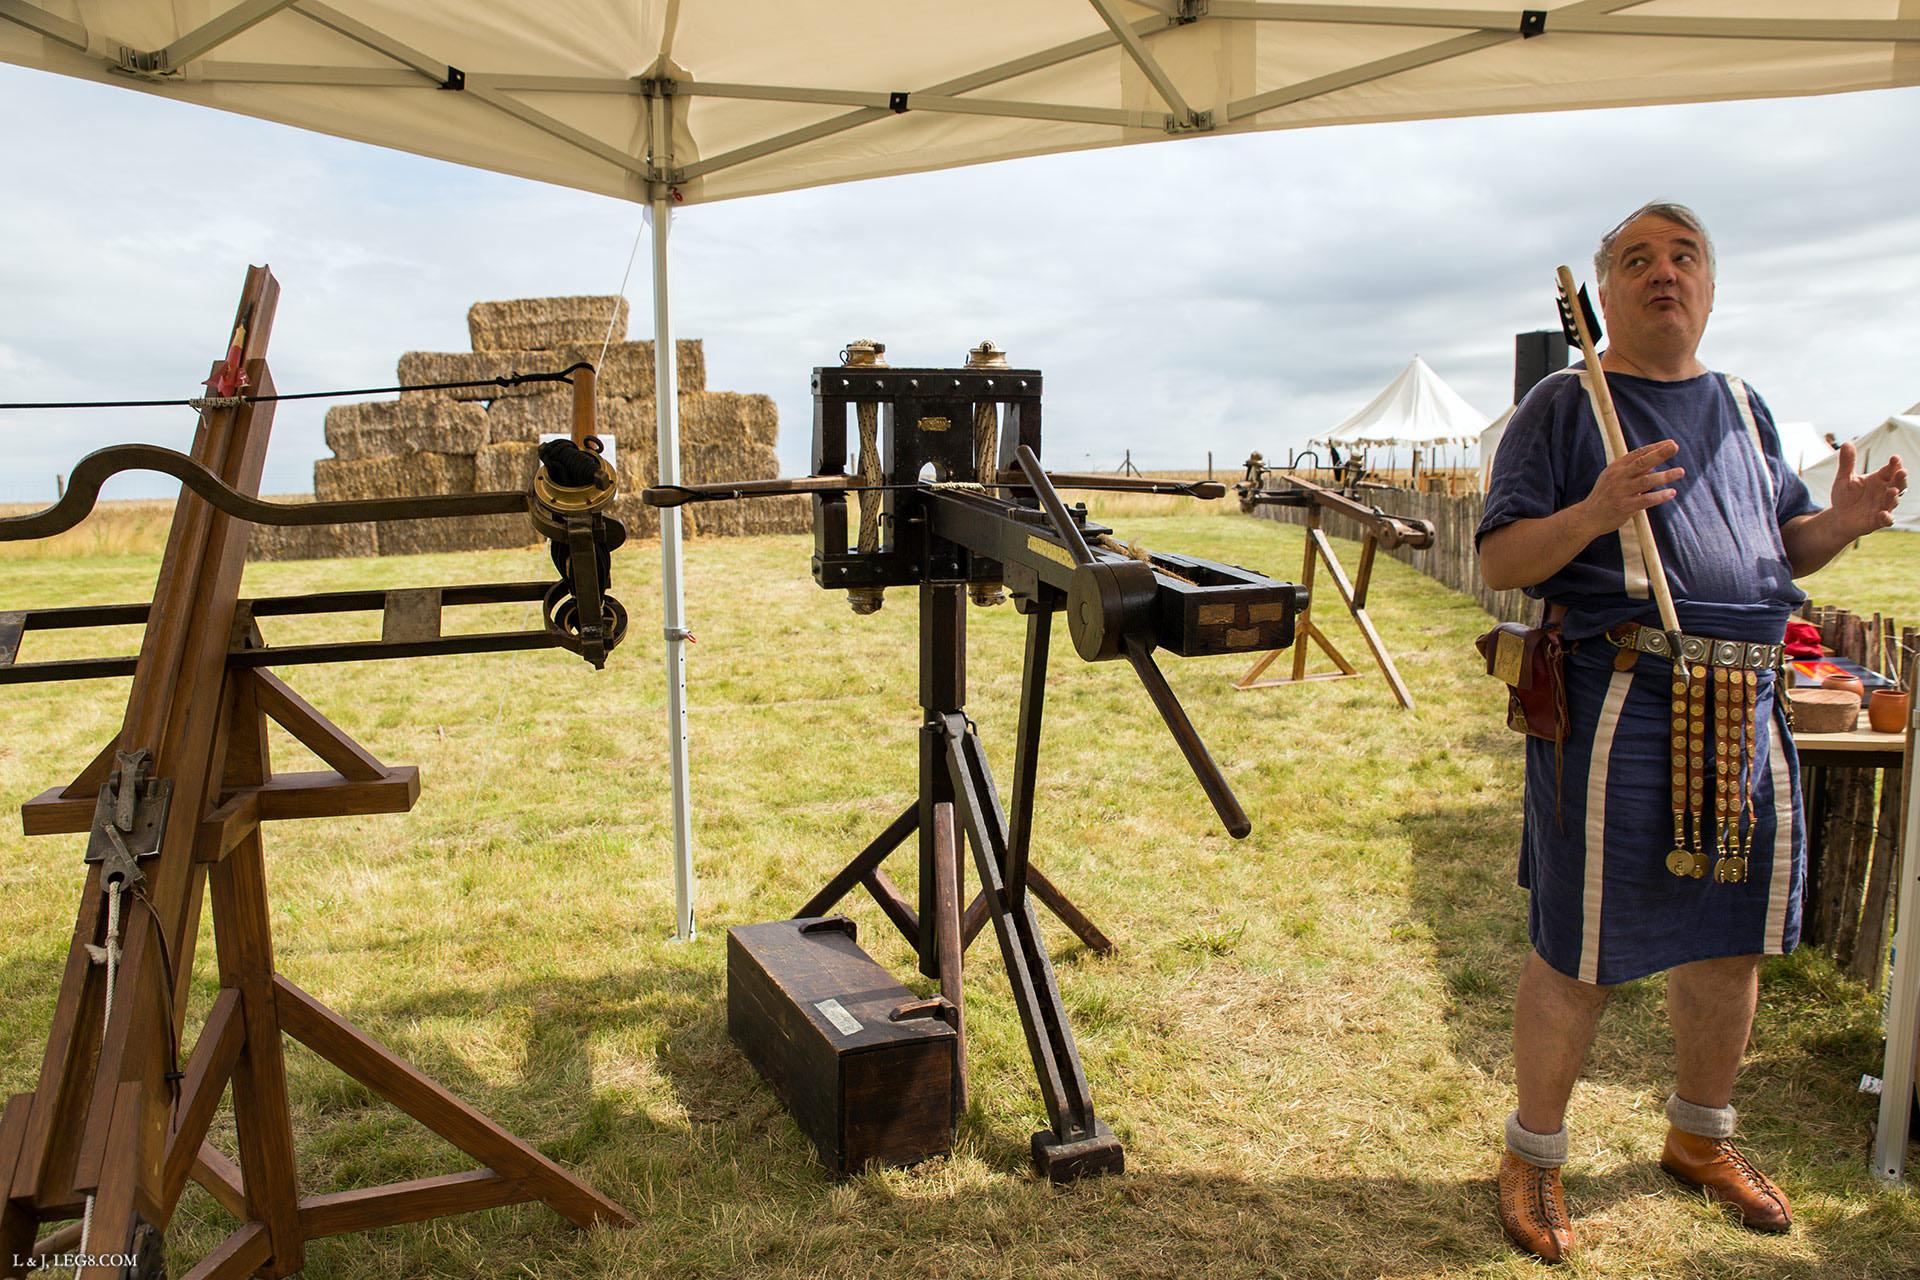 L'artillerie romaine